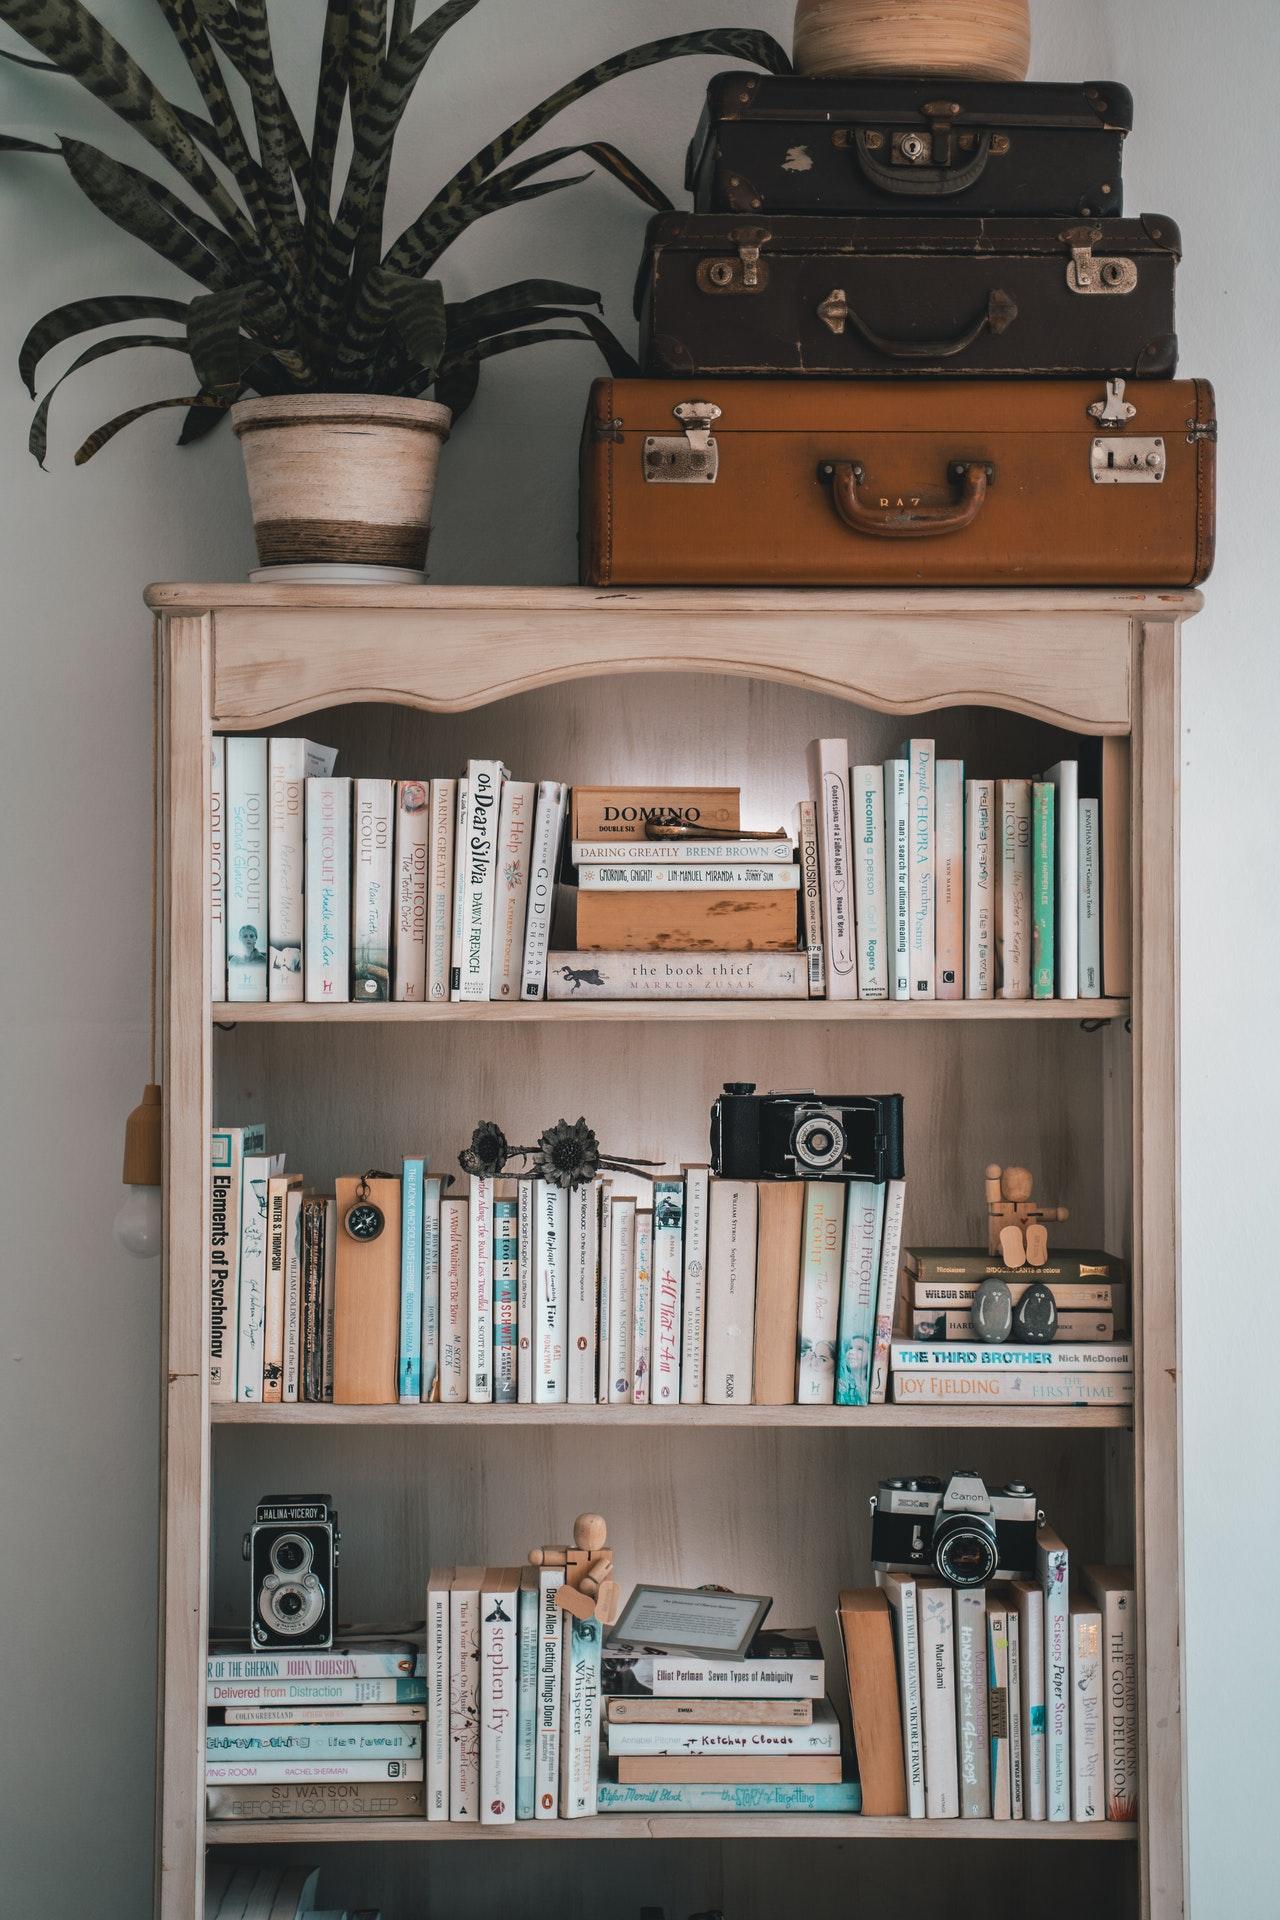 small home decor items on shelves